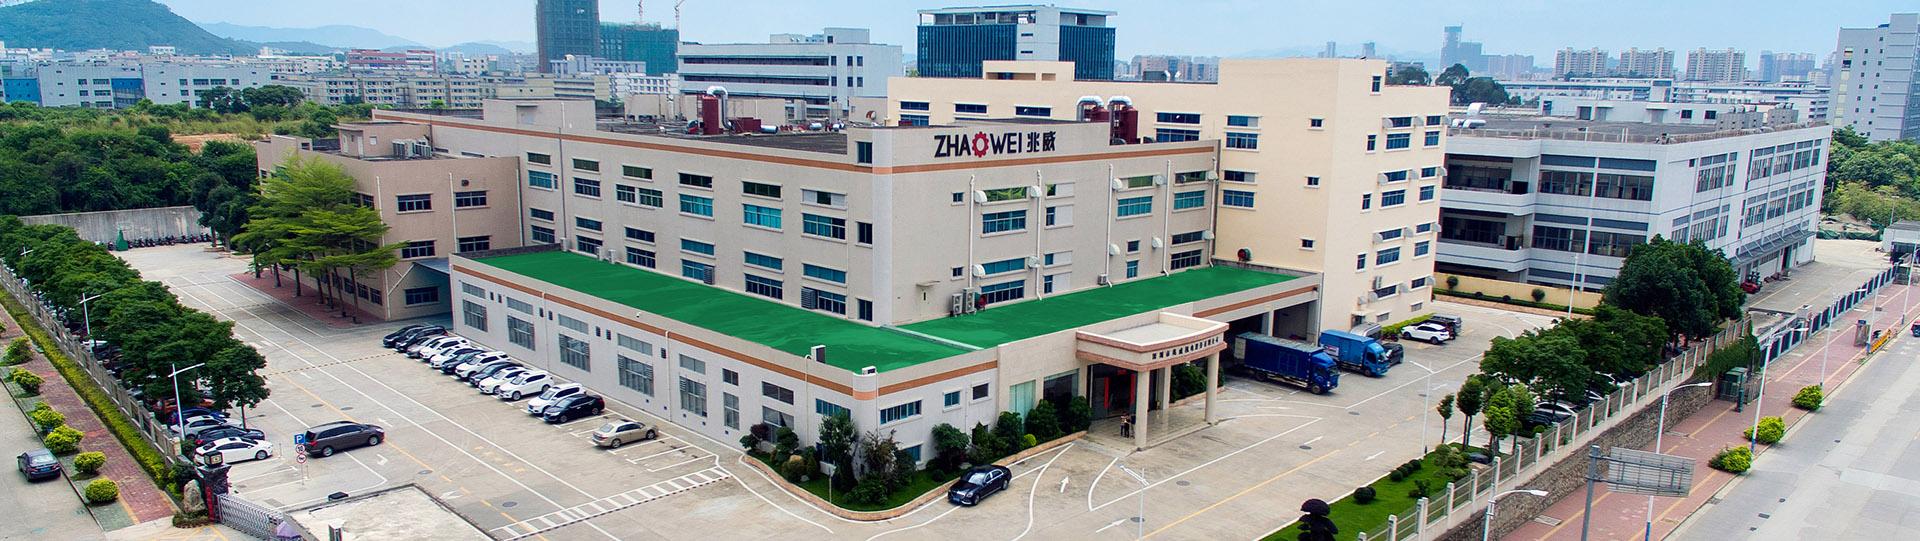 Zhaowei Machinery & Electronics Co., Ltd.